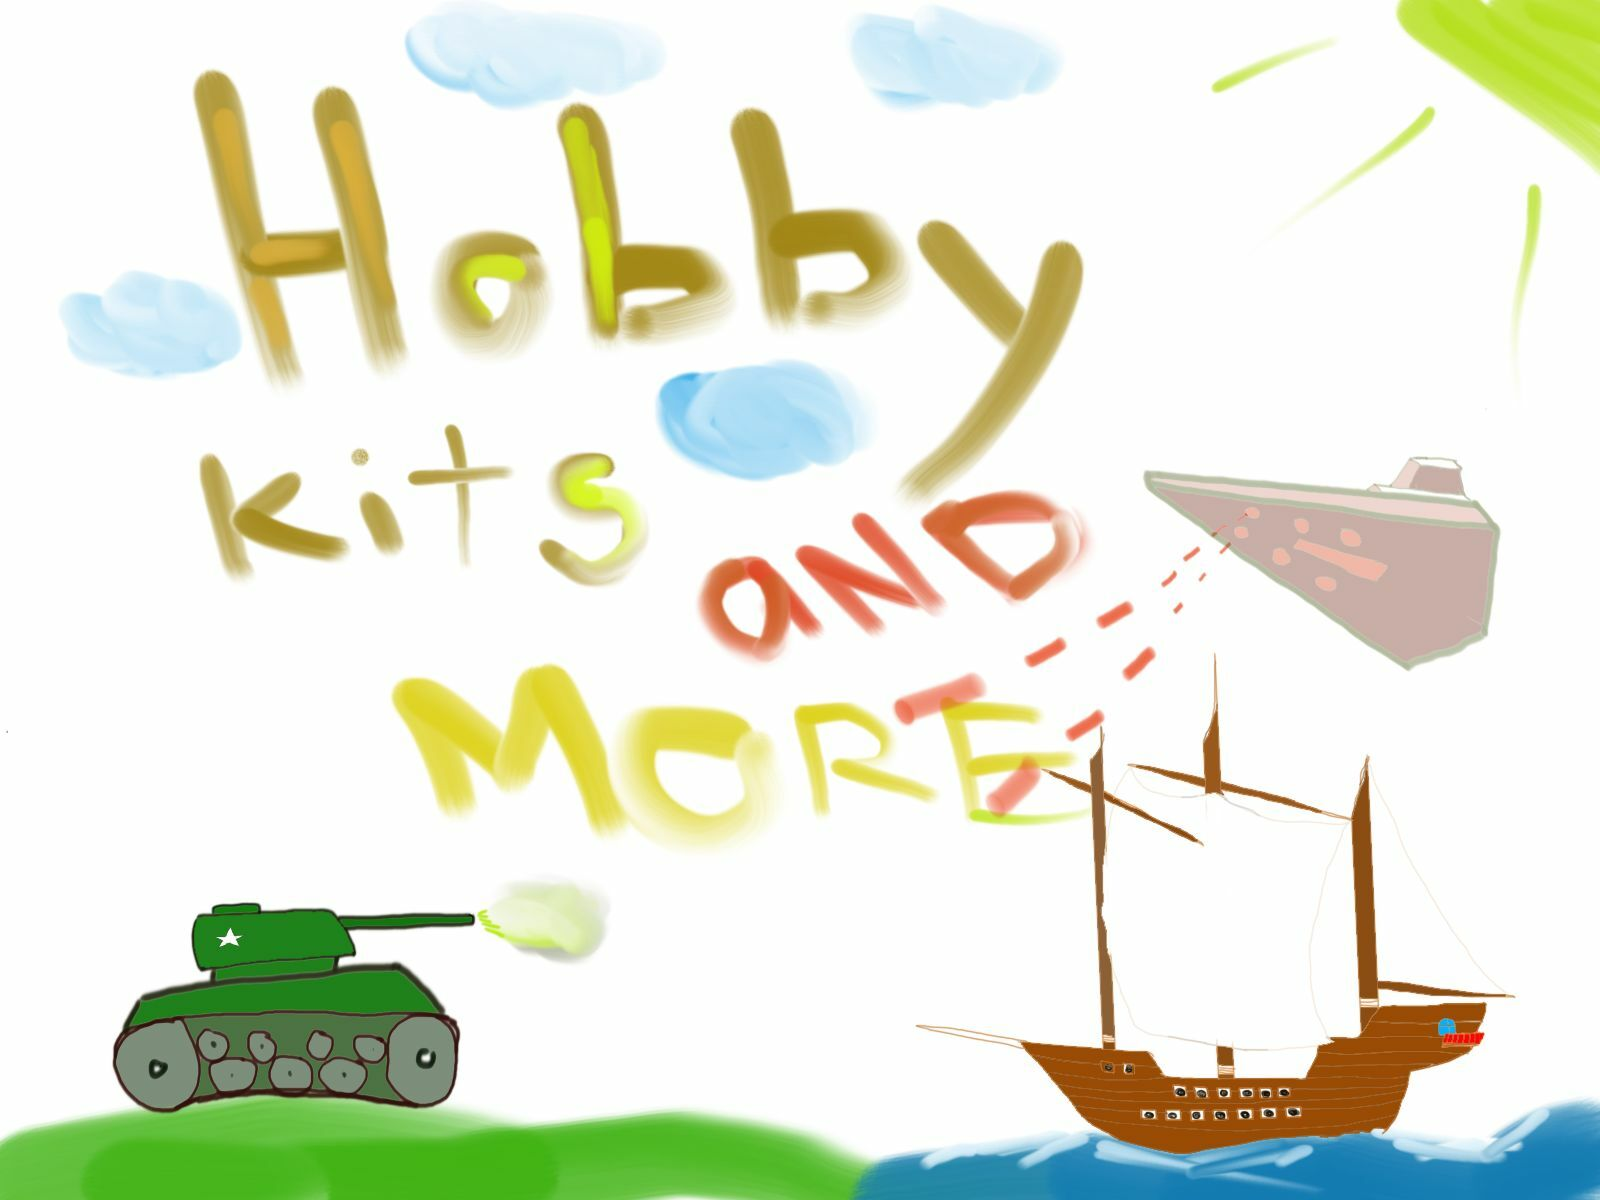 Rev*Hobby*Land